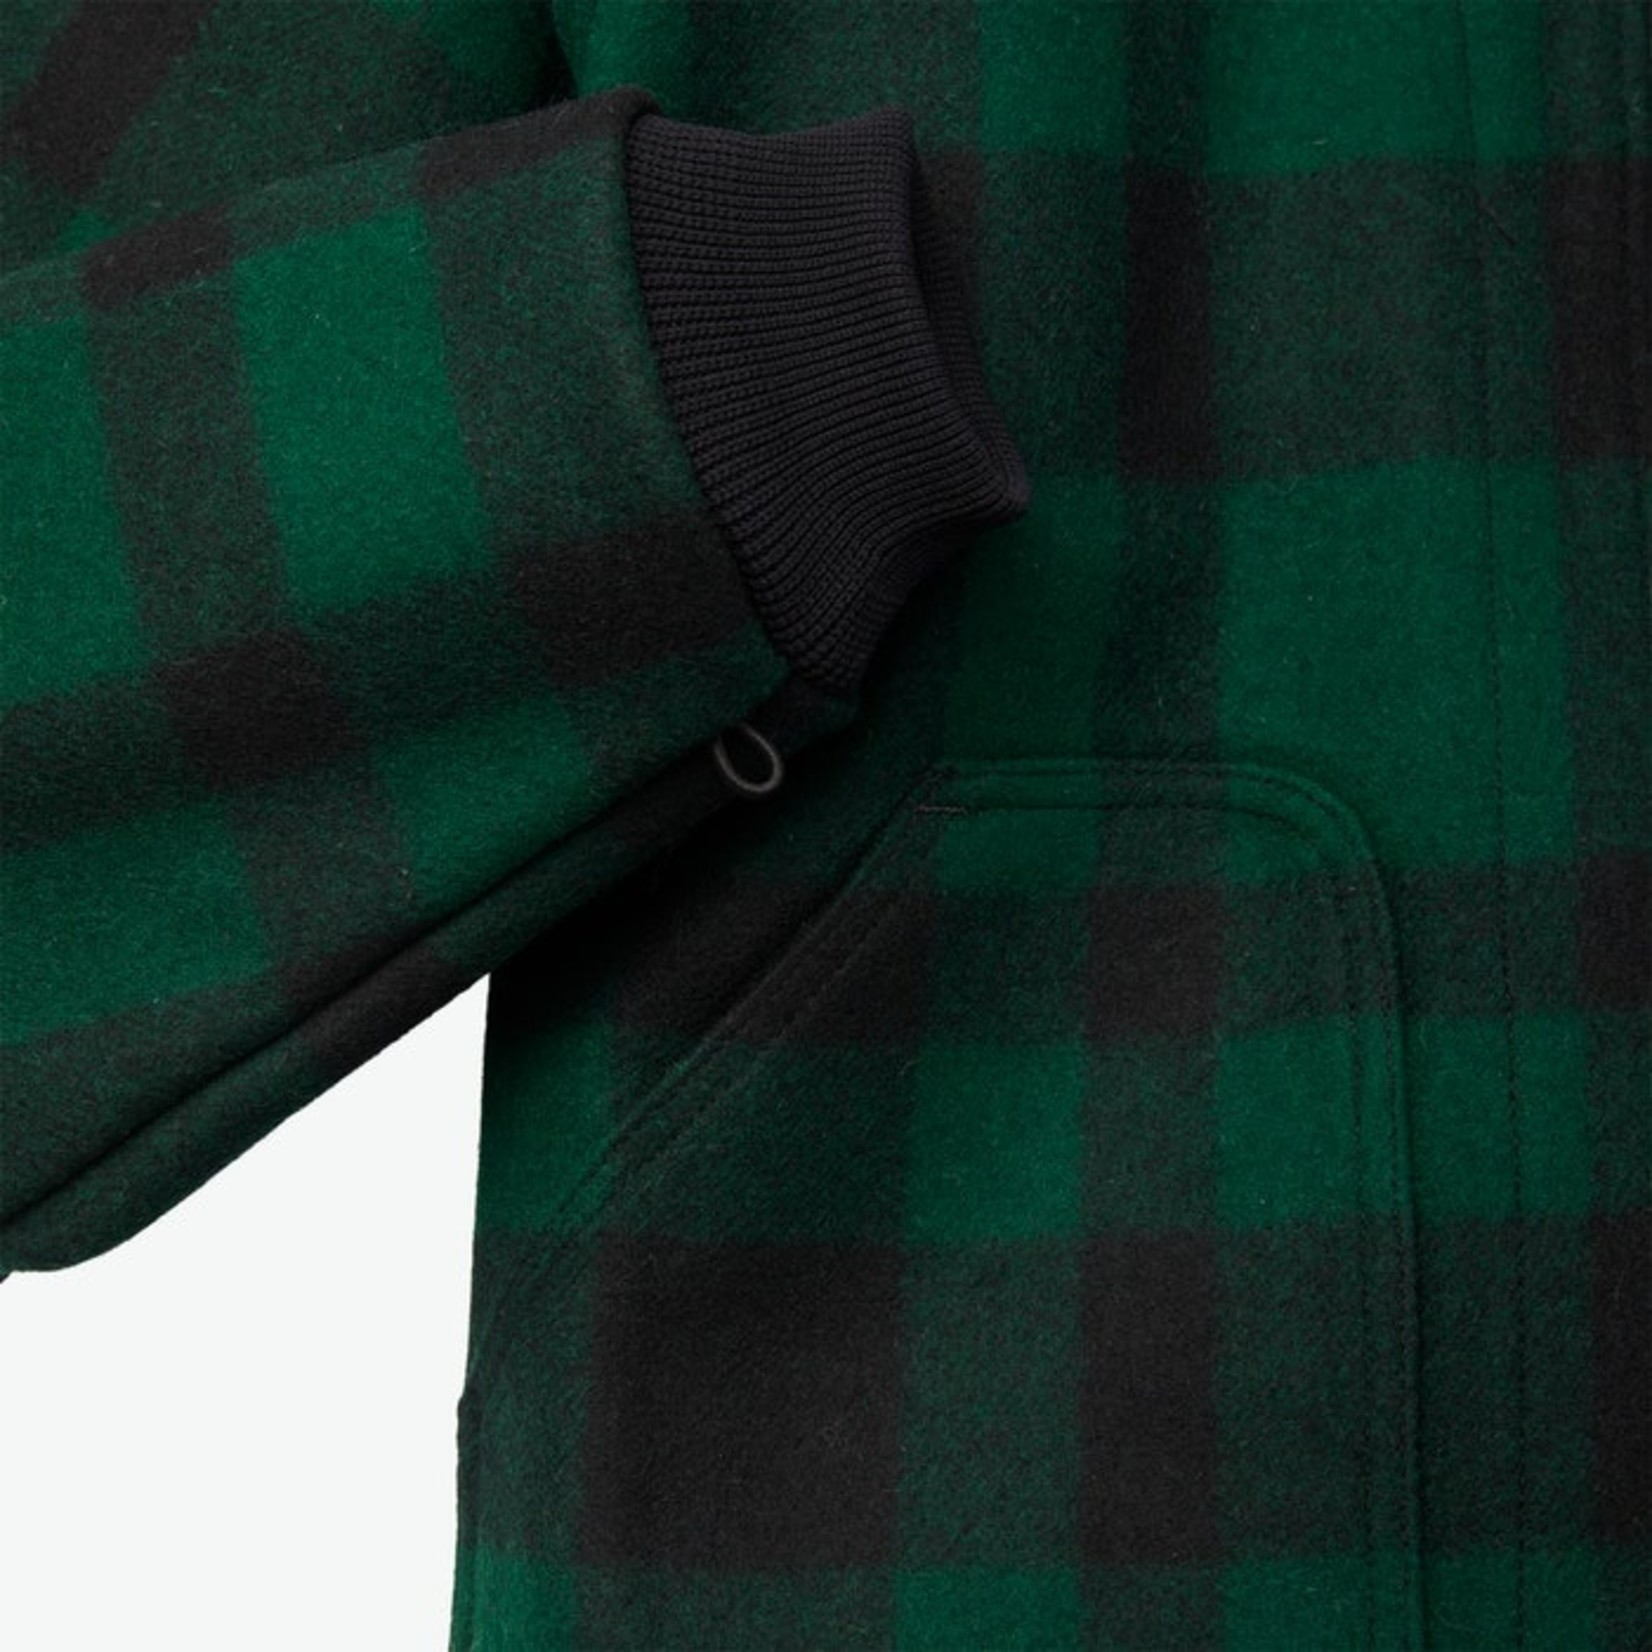 Filson Filson 11010036 Wool Jacket Liner - Green and Black